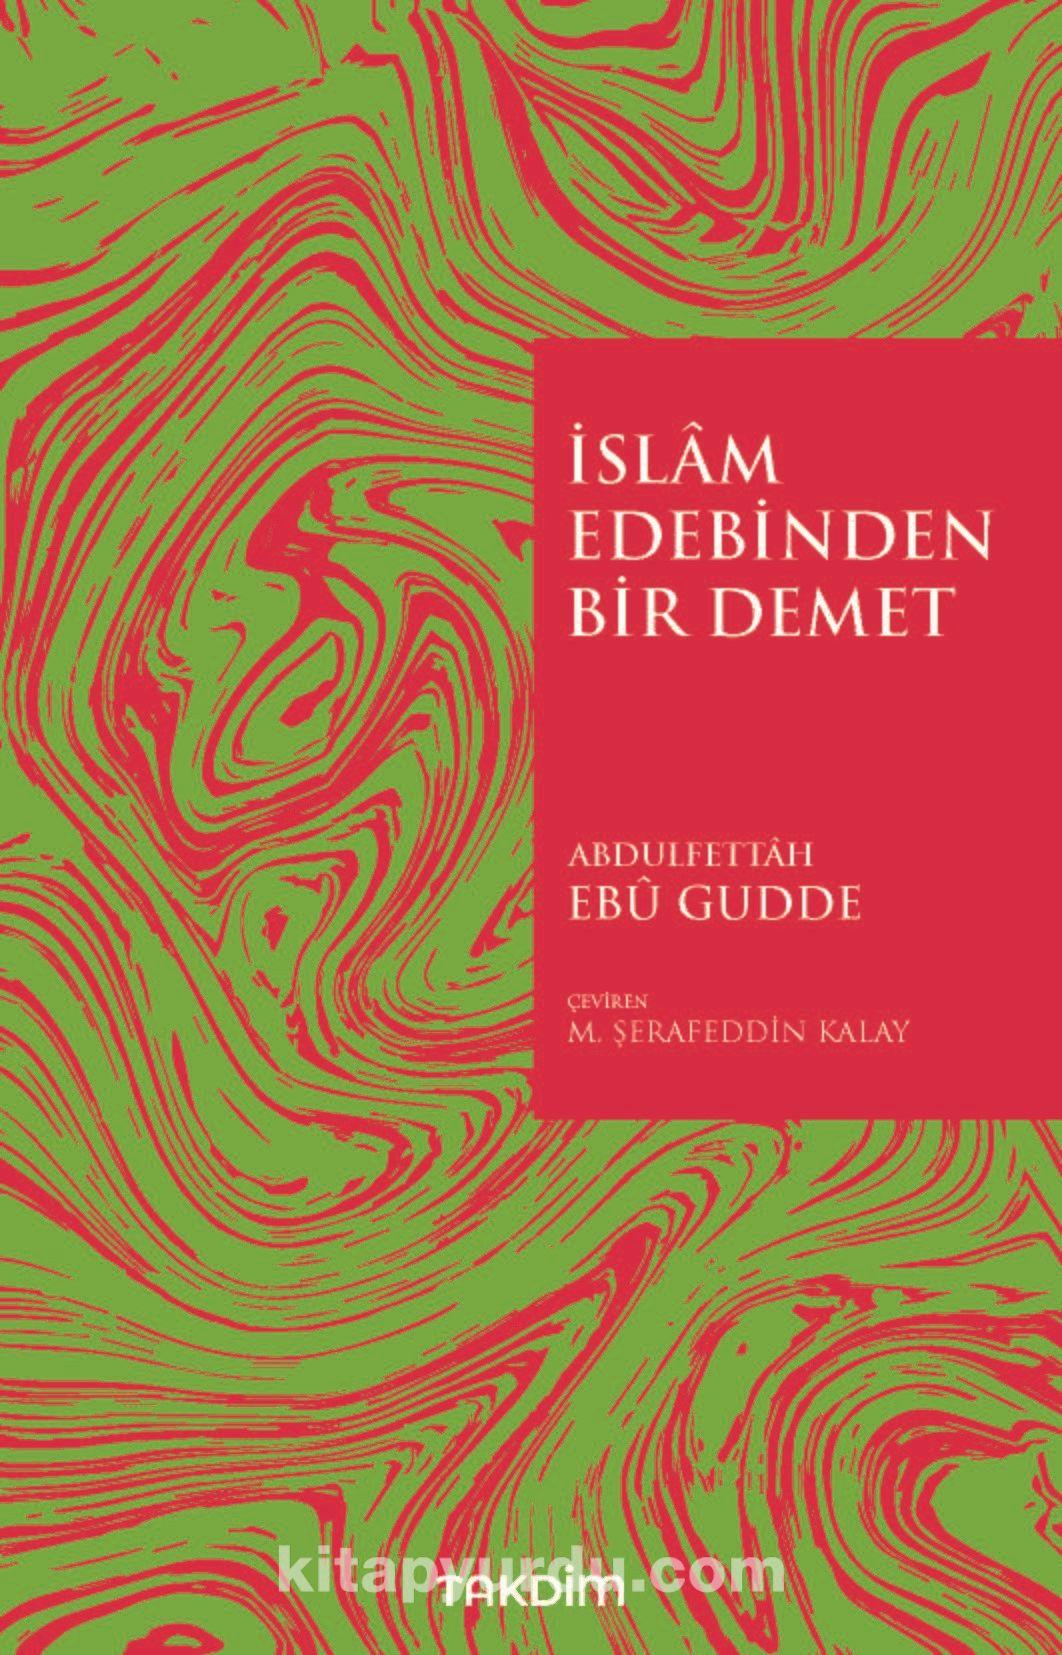 İslam Edebinden Bir Demet - Abdulfettah Ebu Gudde pdf epub